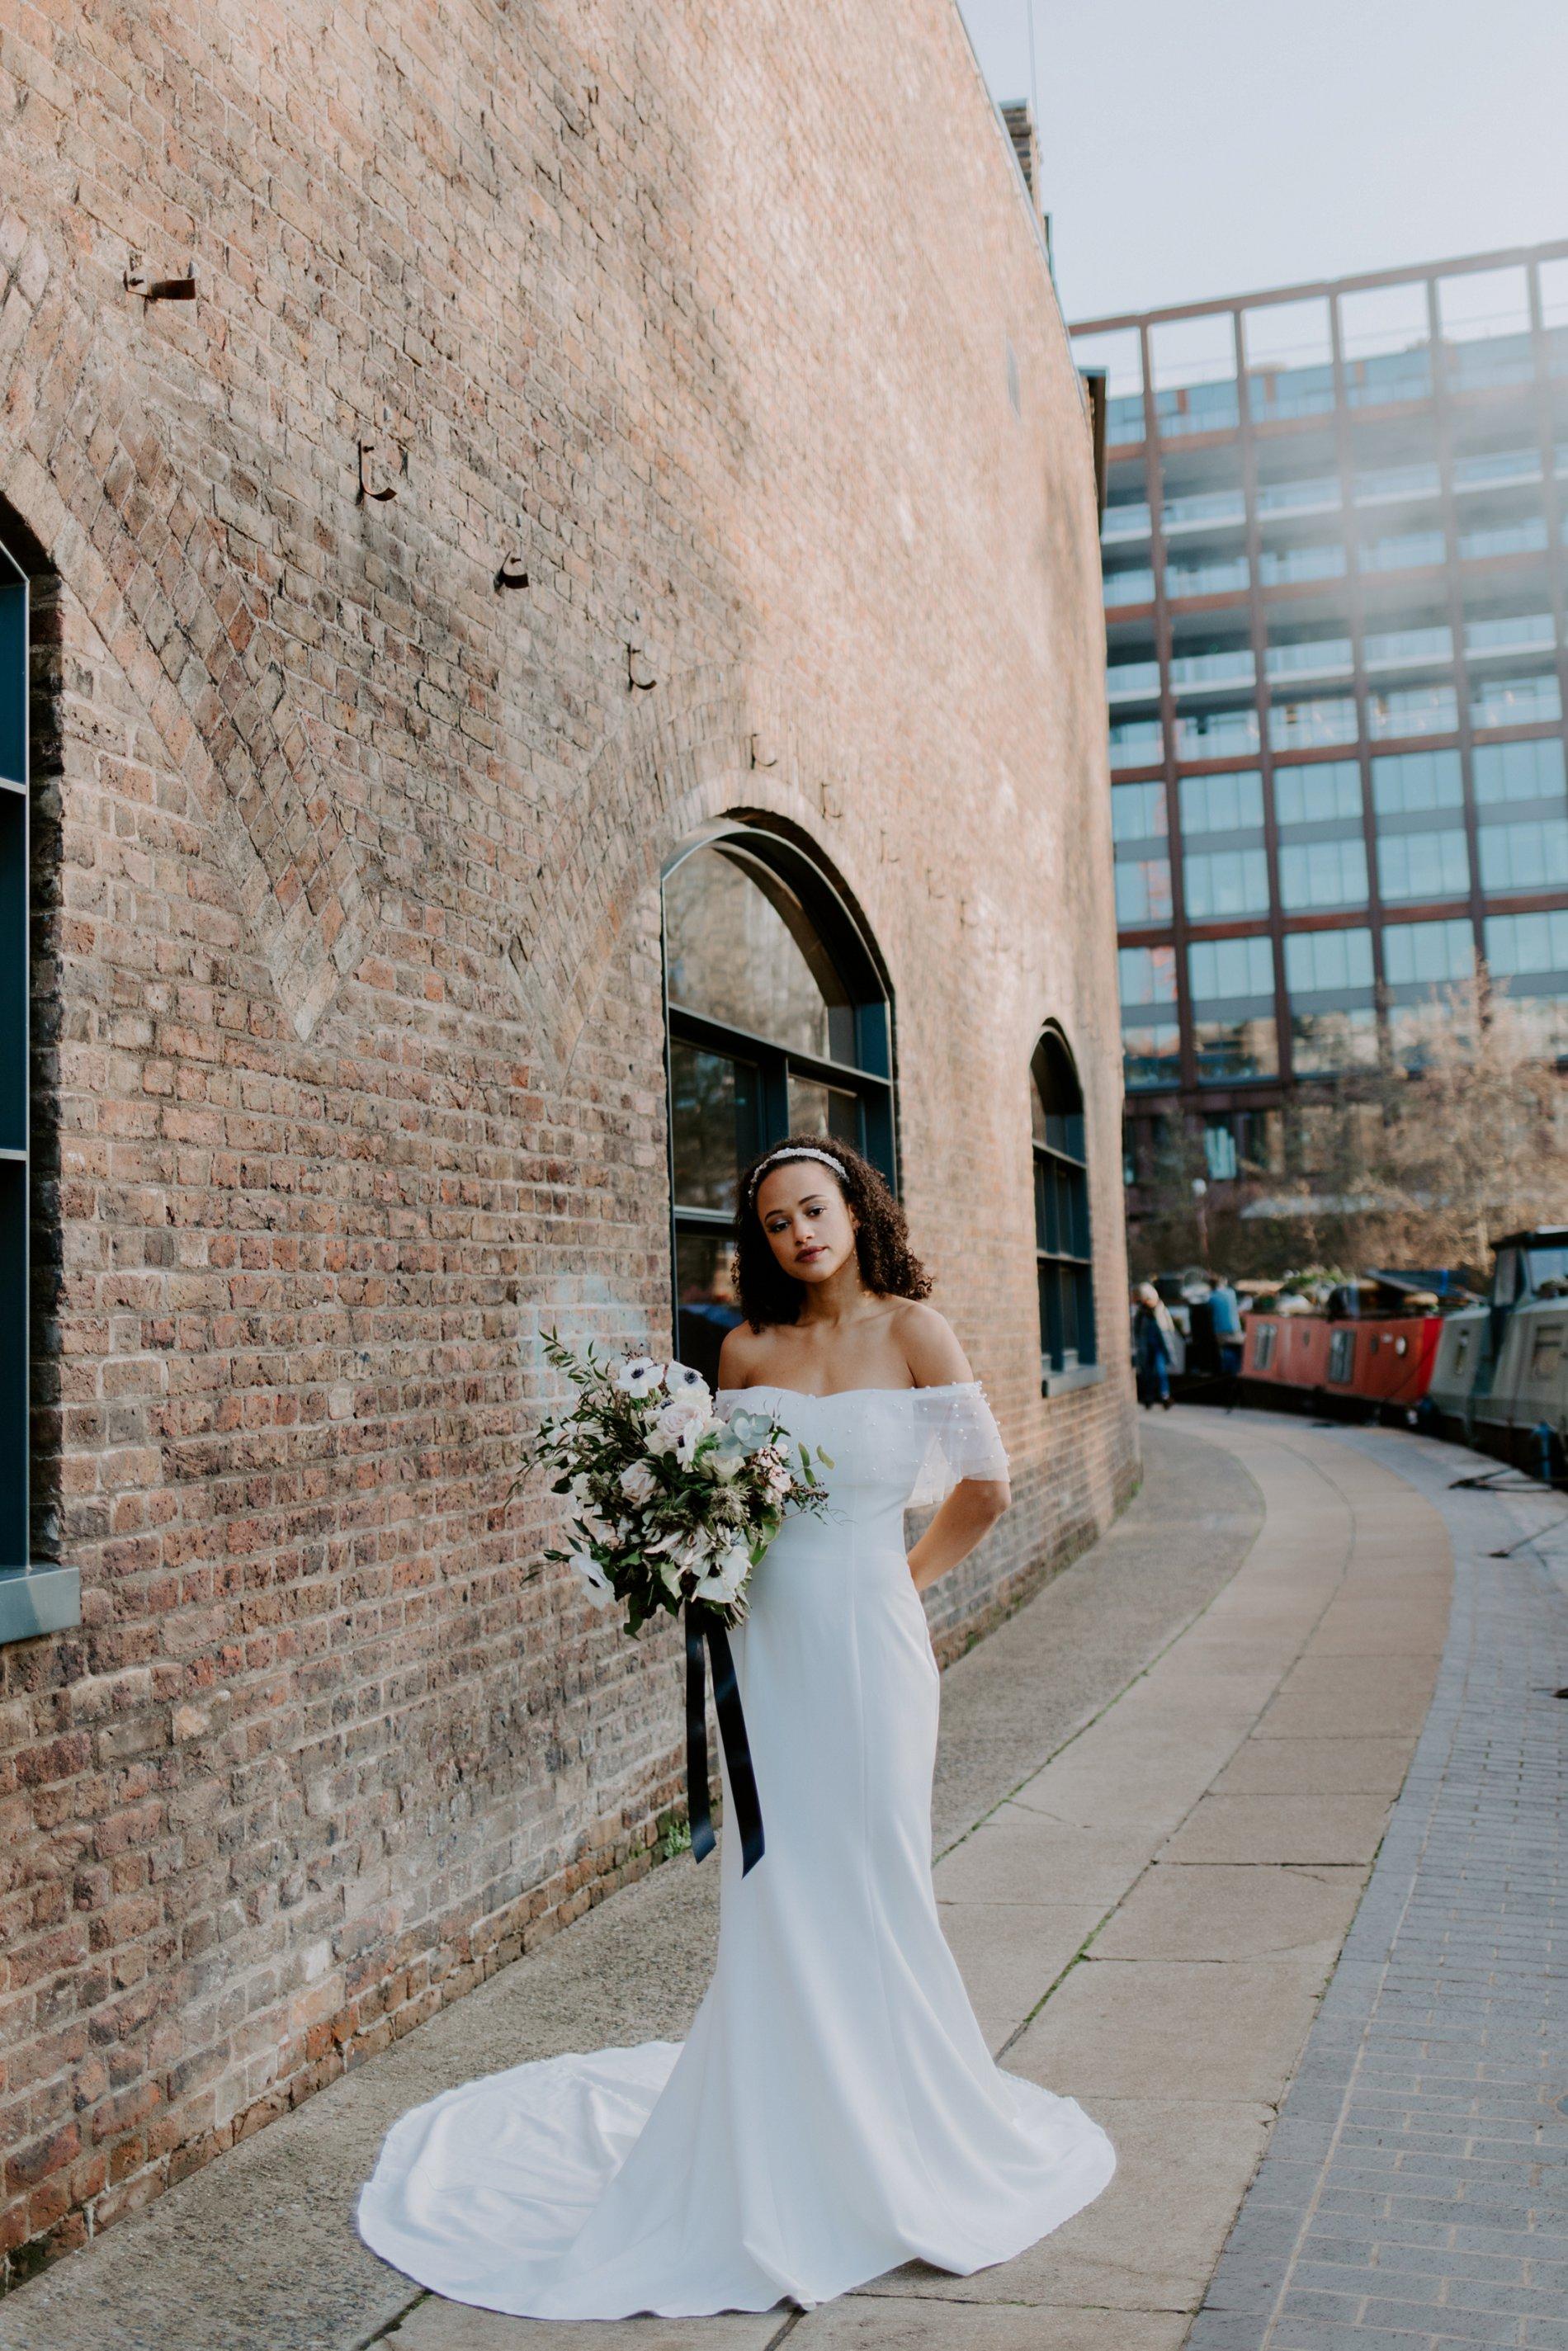 City Wedding Styled Shoot at Coal Drops Yard (c) Emztography (44)